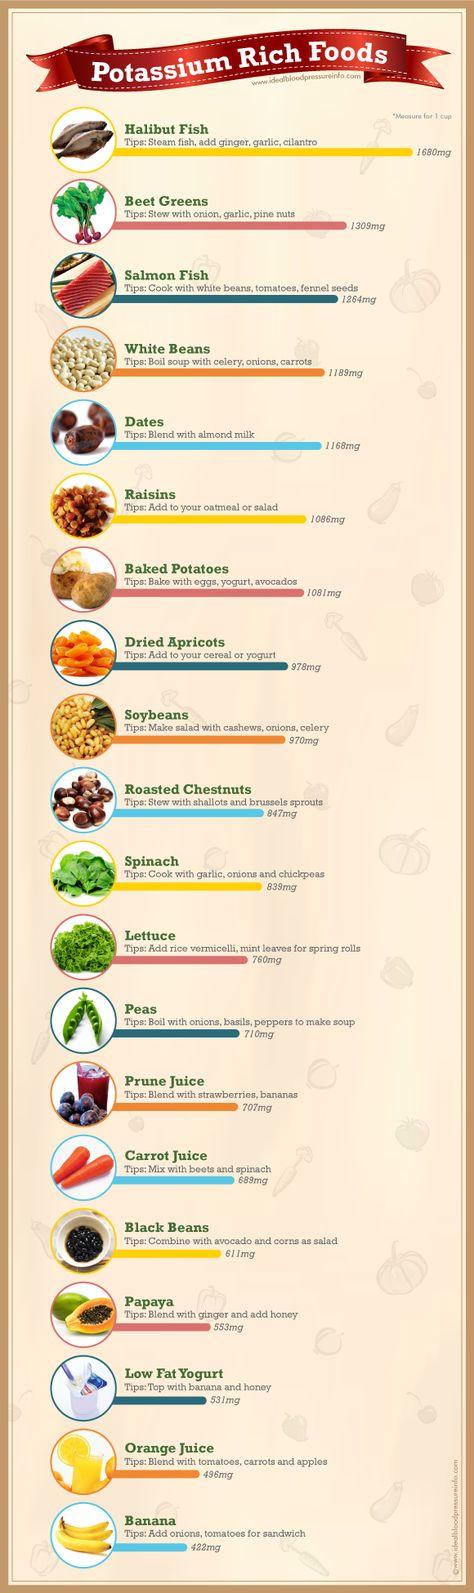 Potassium Rich Foods New Studies Show Adding Potassium And